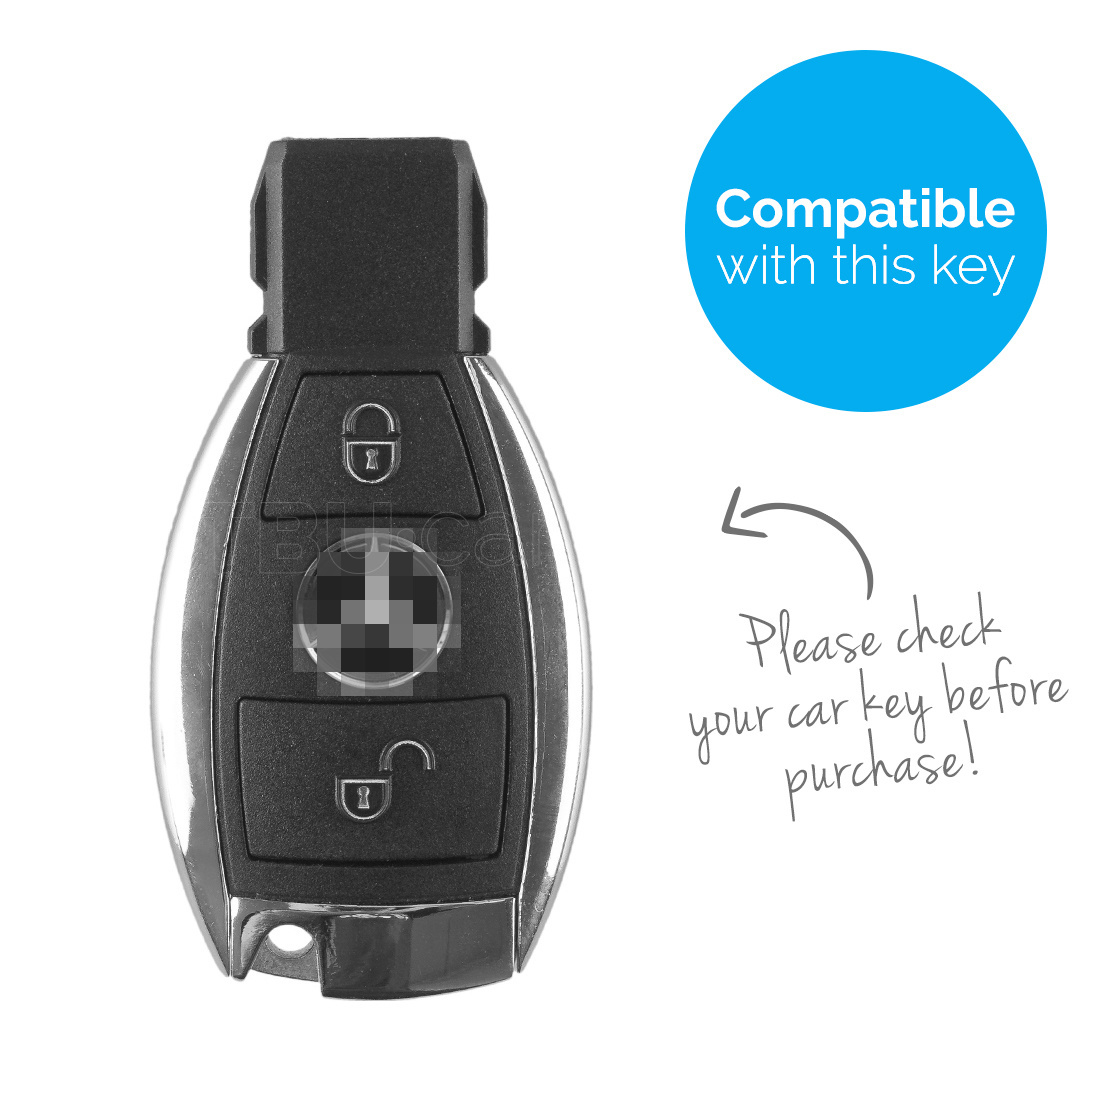 TBU car Autoschlüssel Hülle für Mercedes 2 Tasten - Schutzhülle aus Silikon - Auto Schlüsselhülle Cover in Rosa